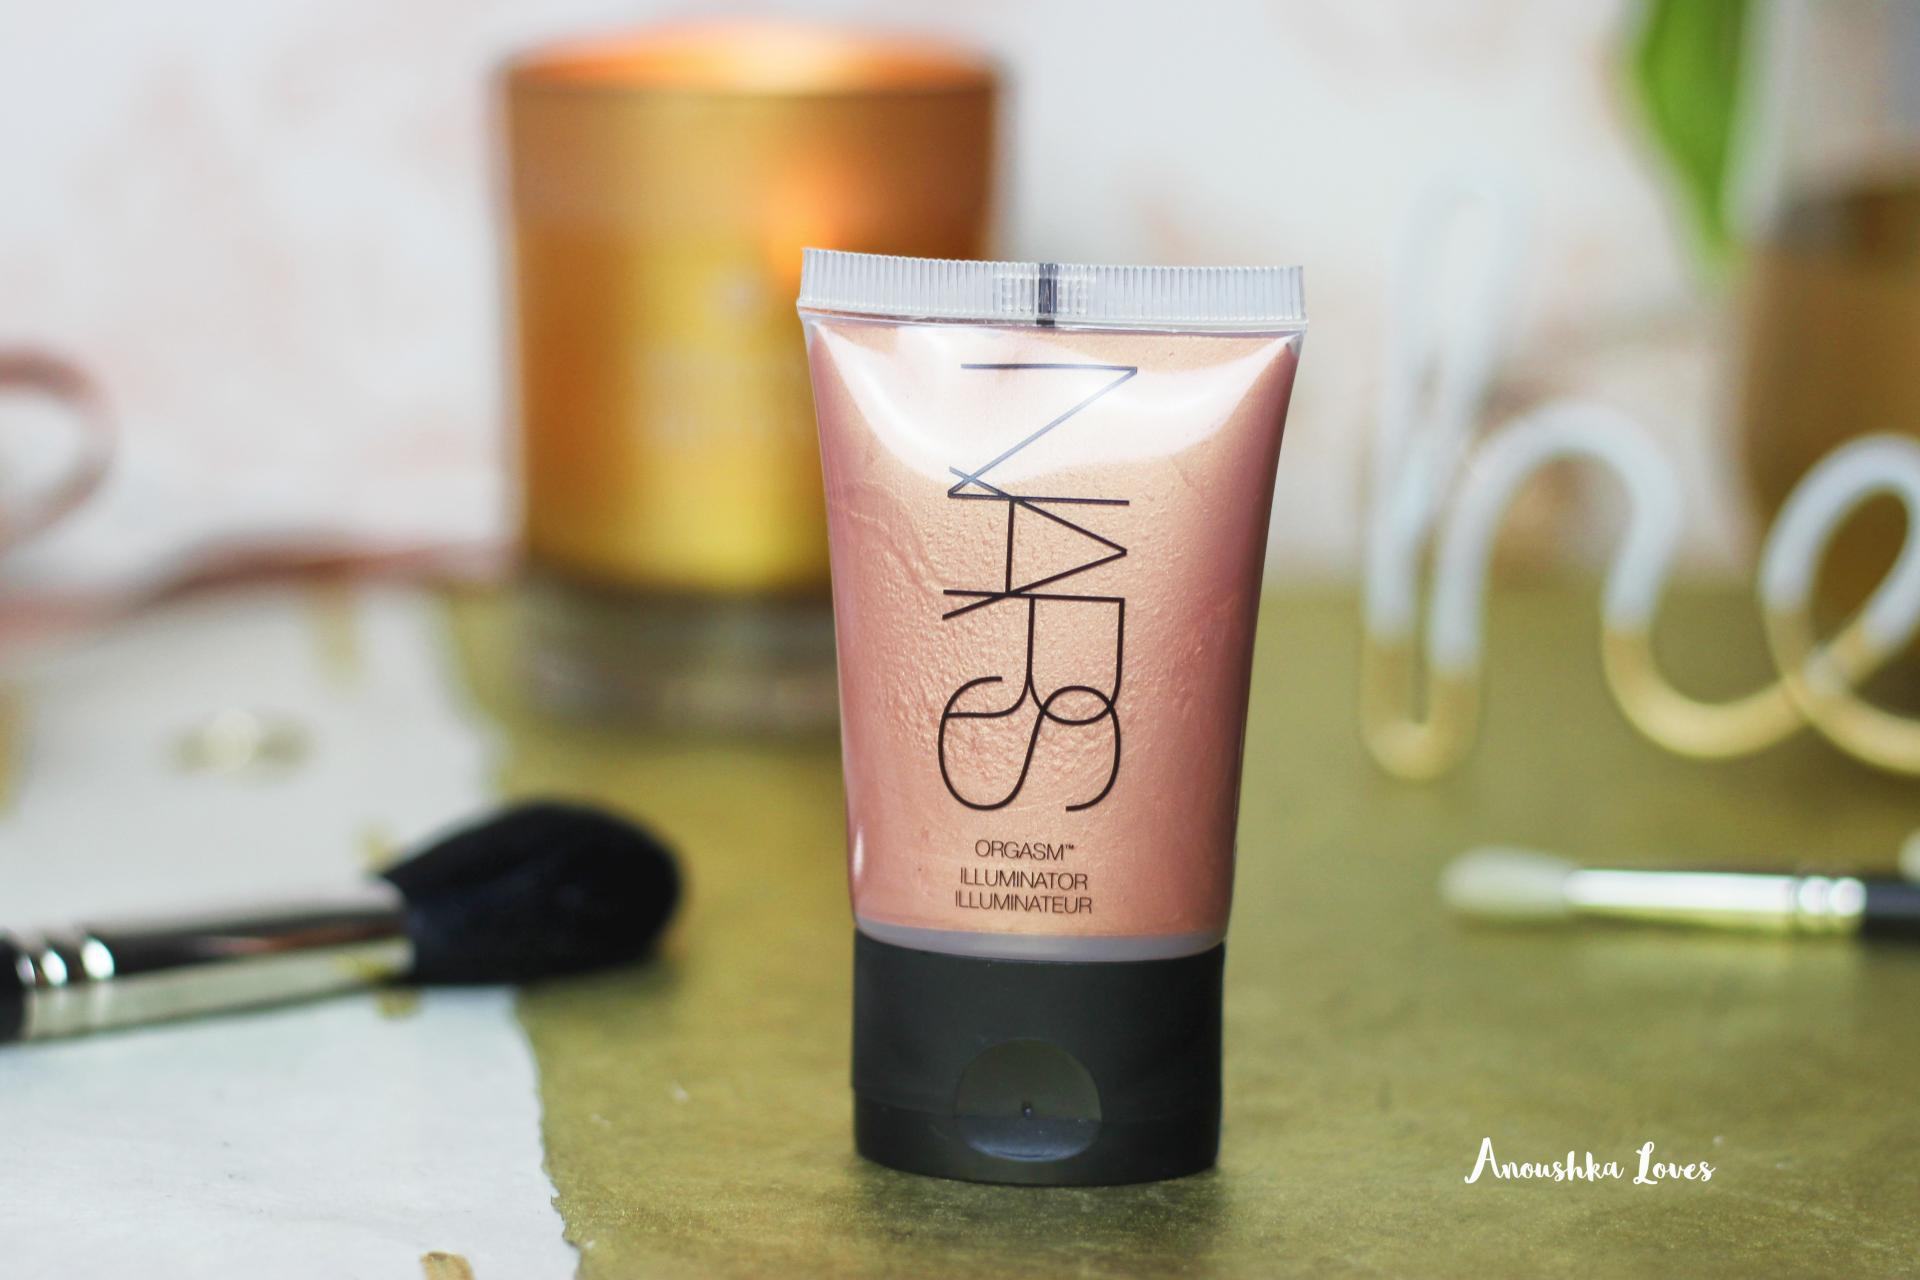 Fragrance Direct Does Makeup! Nars Orgasm Illuminator